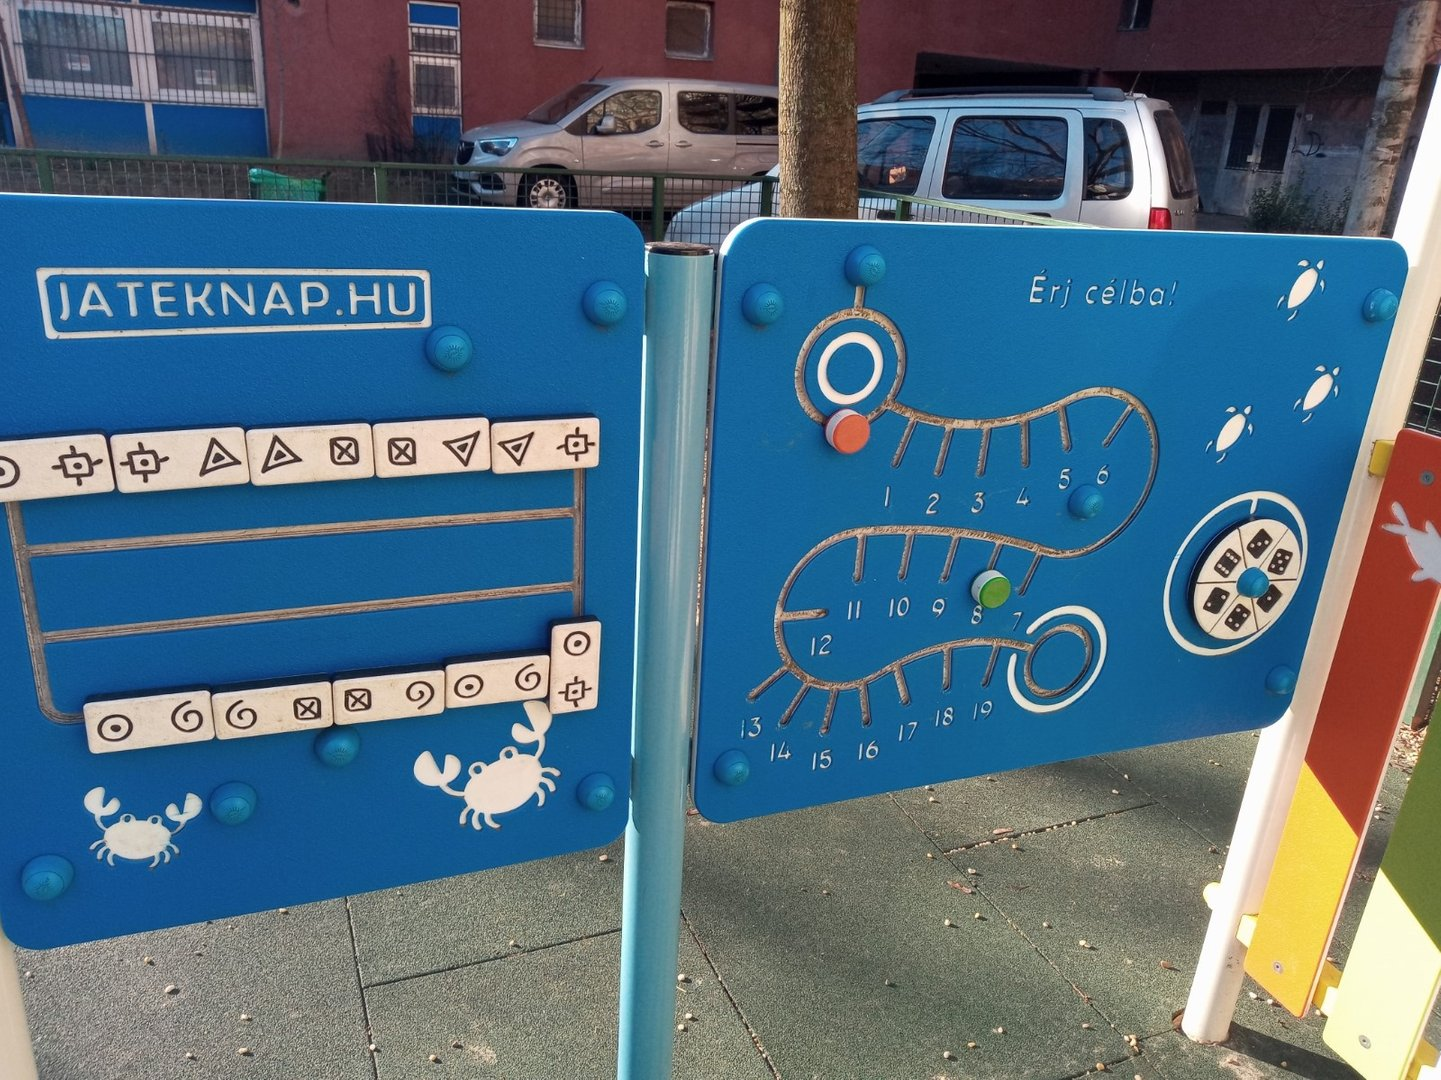 Playground toys